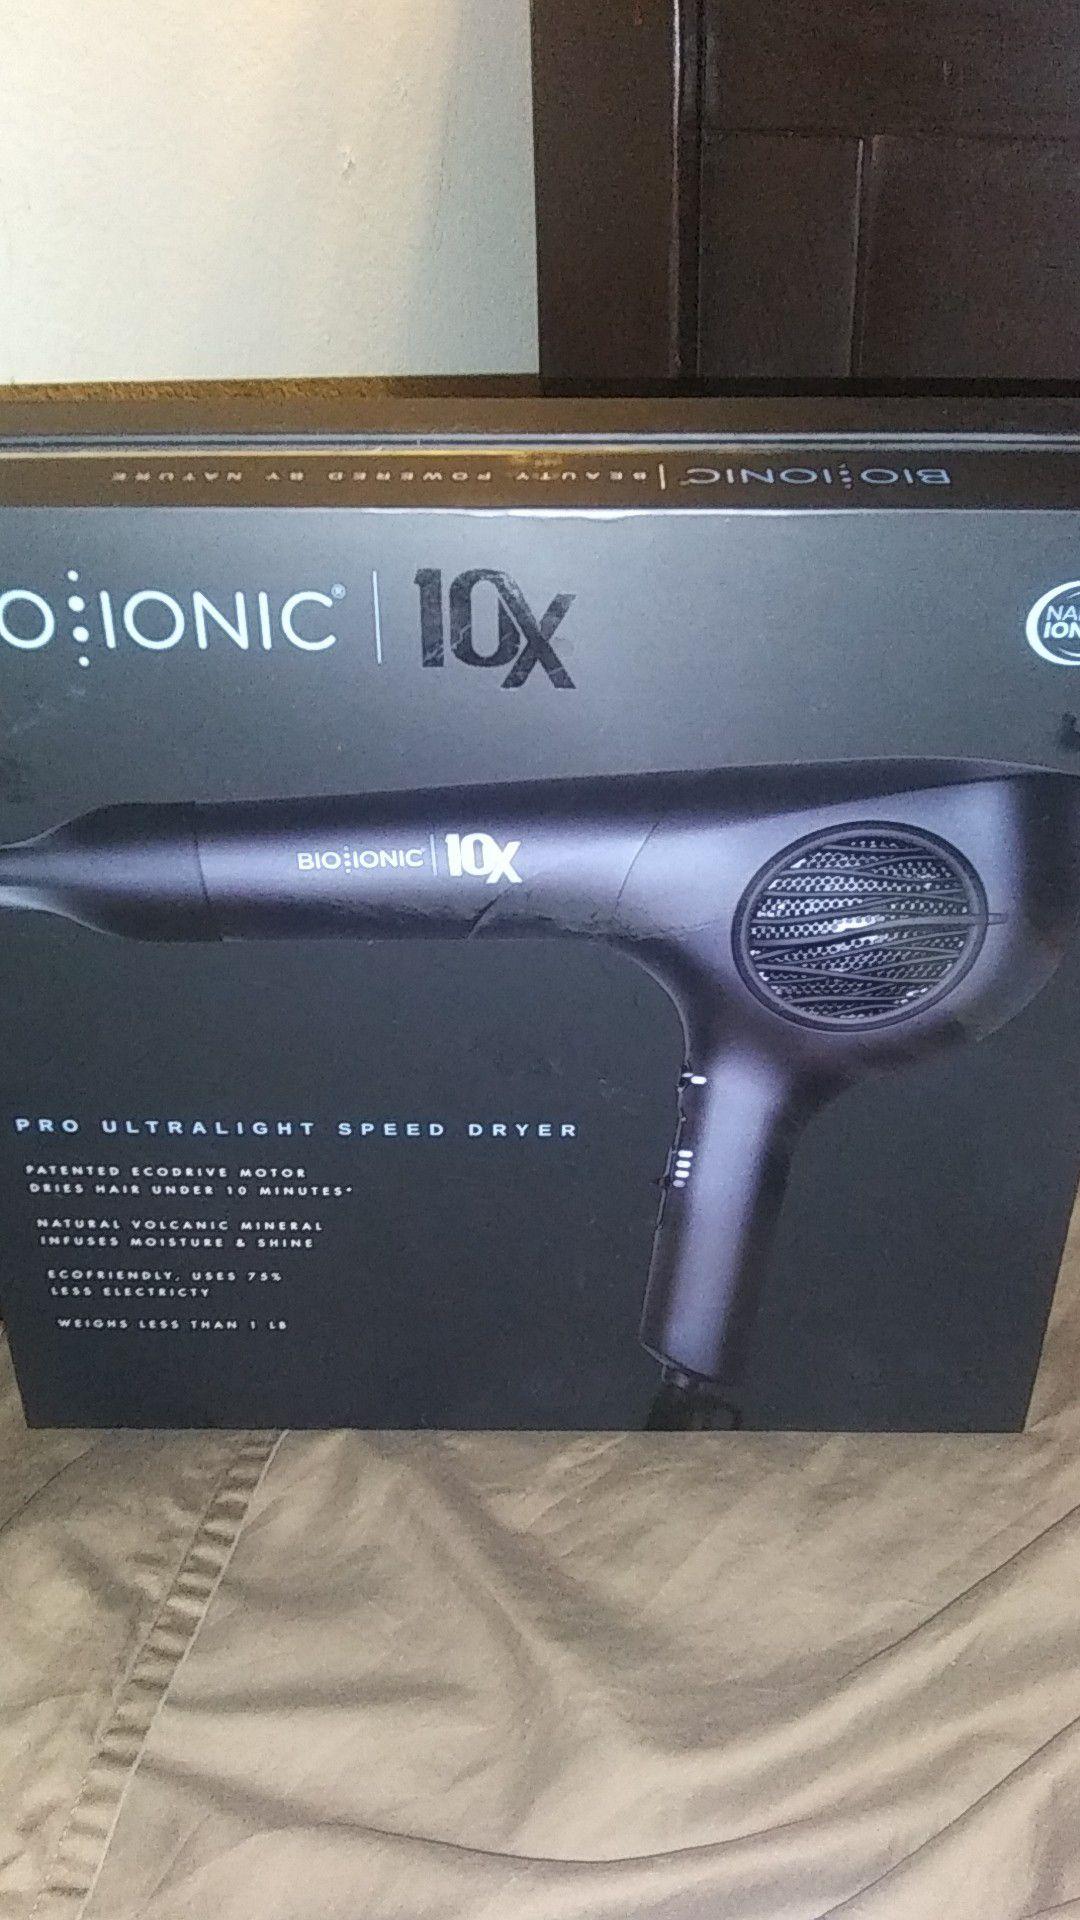 Bio ionic 10x blow dryer